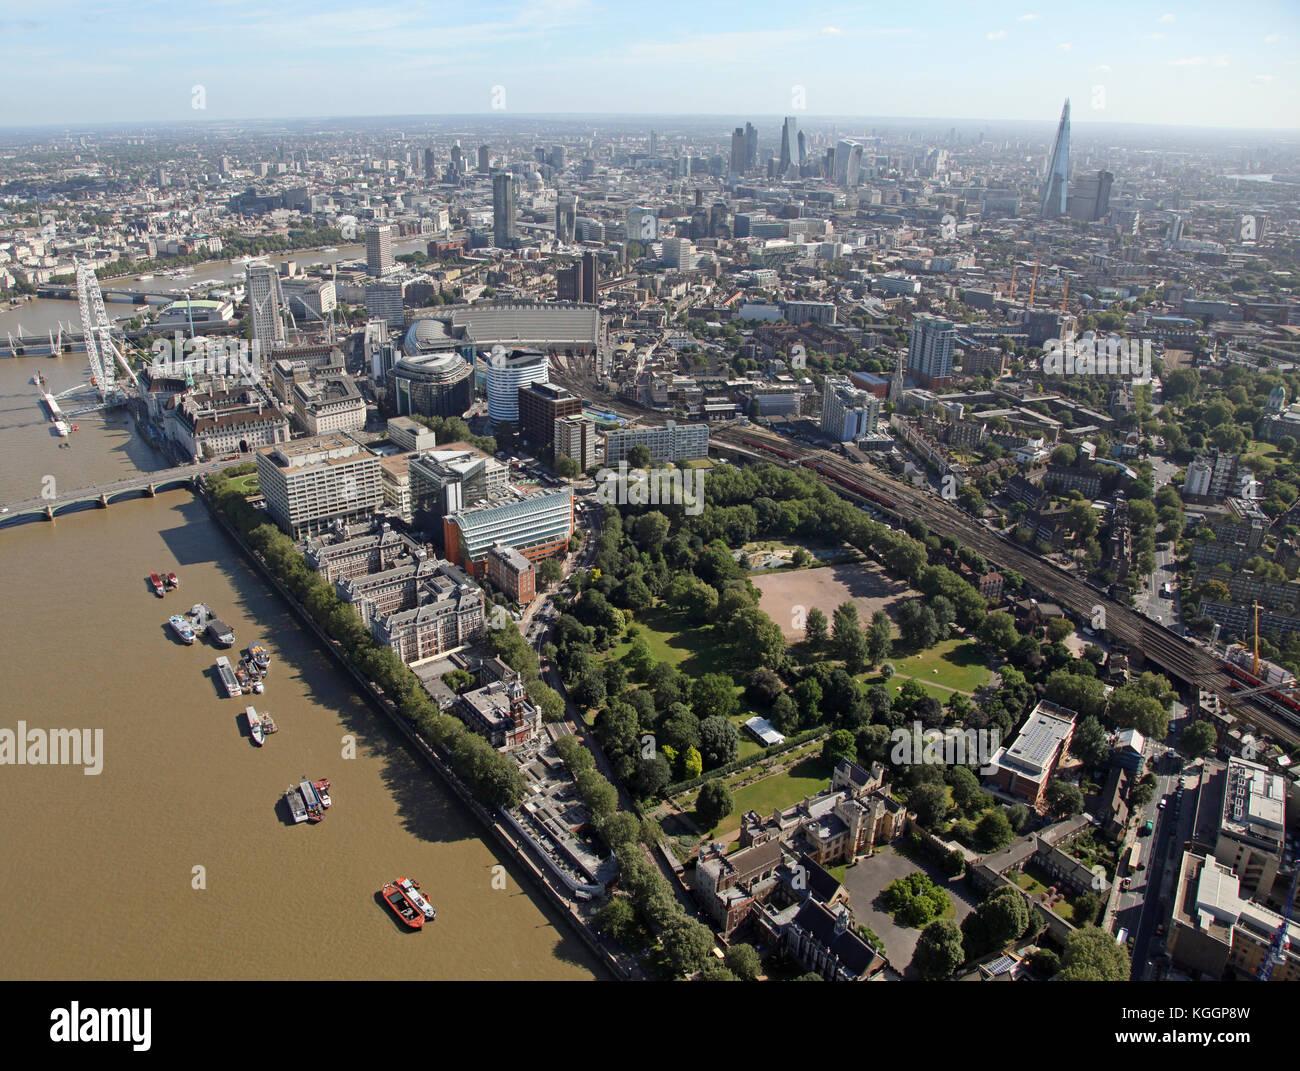 aerial view of Lambeth Palace & St Thomas' Hospital looking toward The City of London skyline, UK - Stock Image